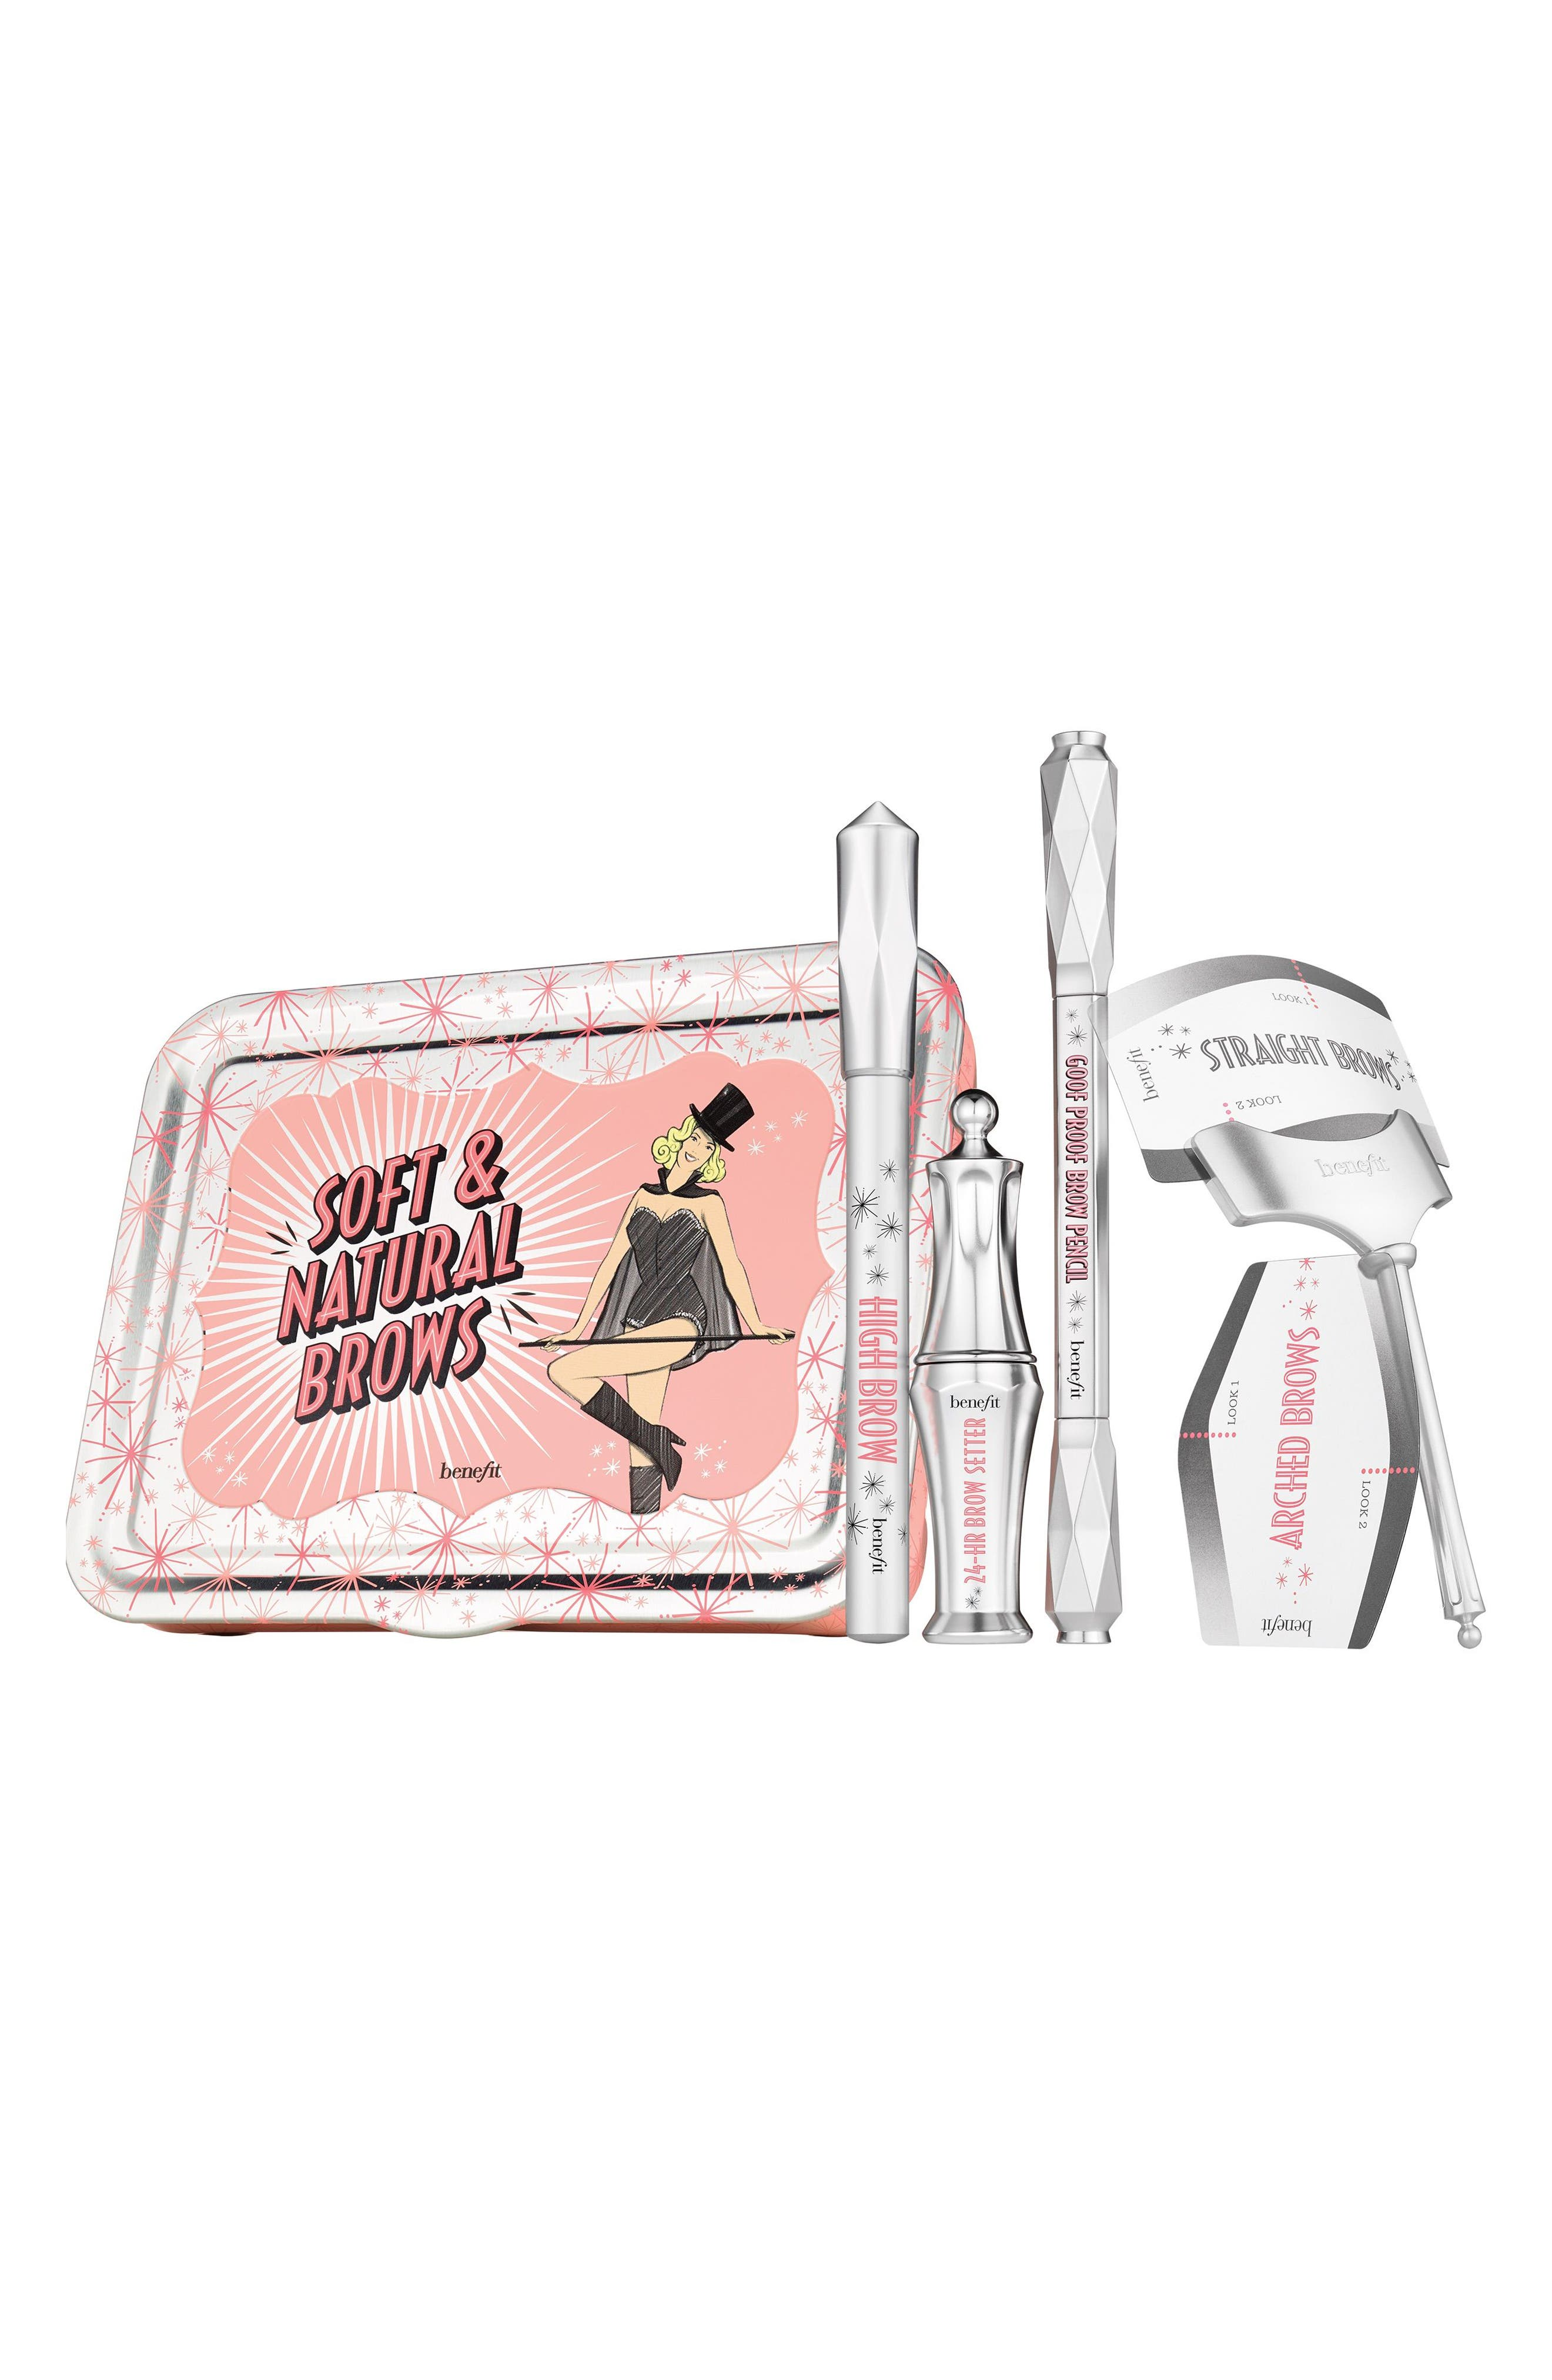 Benefit Soft & Natural Brows Kit,                             Alternate thumbnail 5, color,                             03 Medium